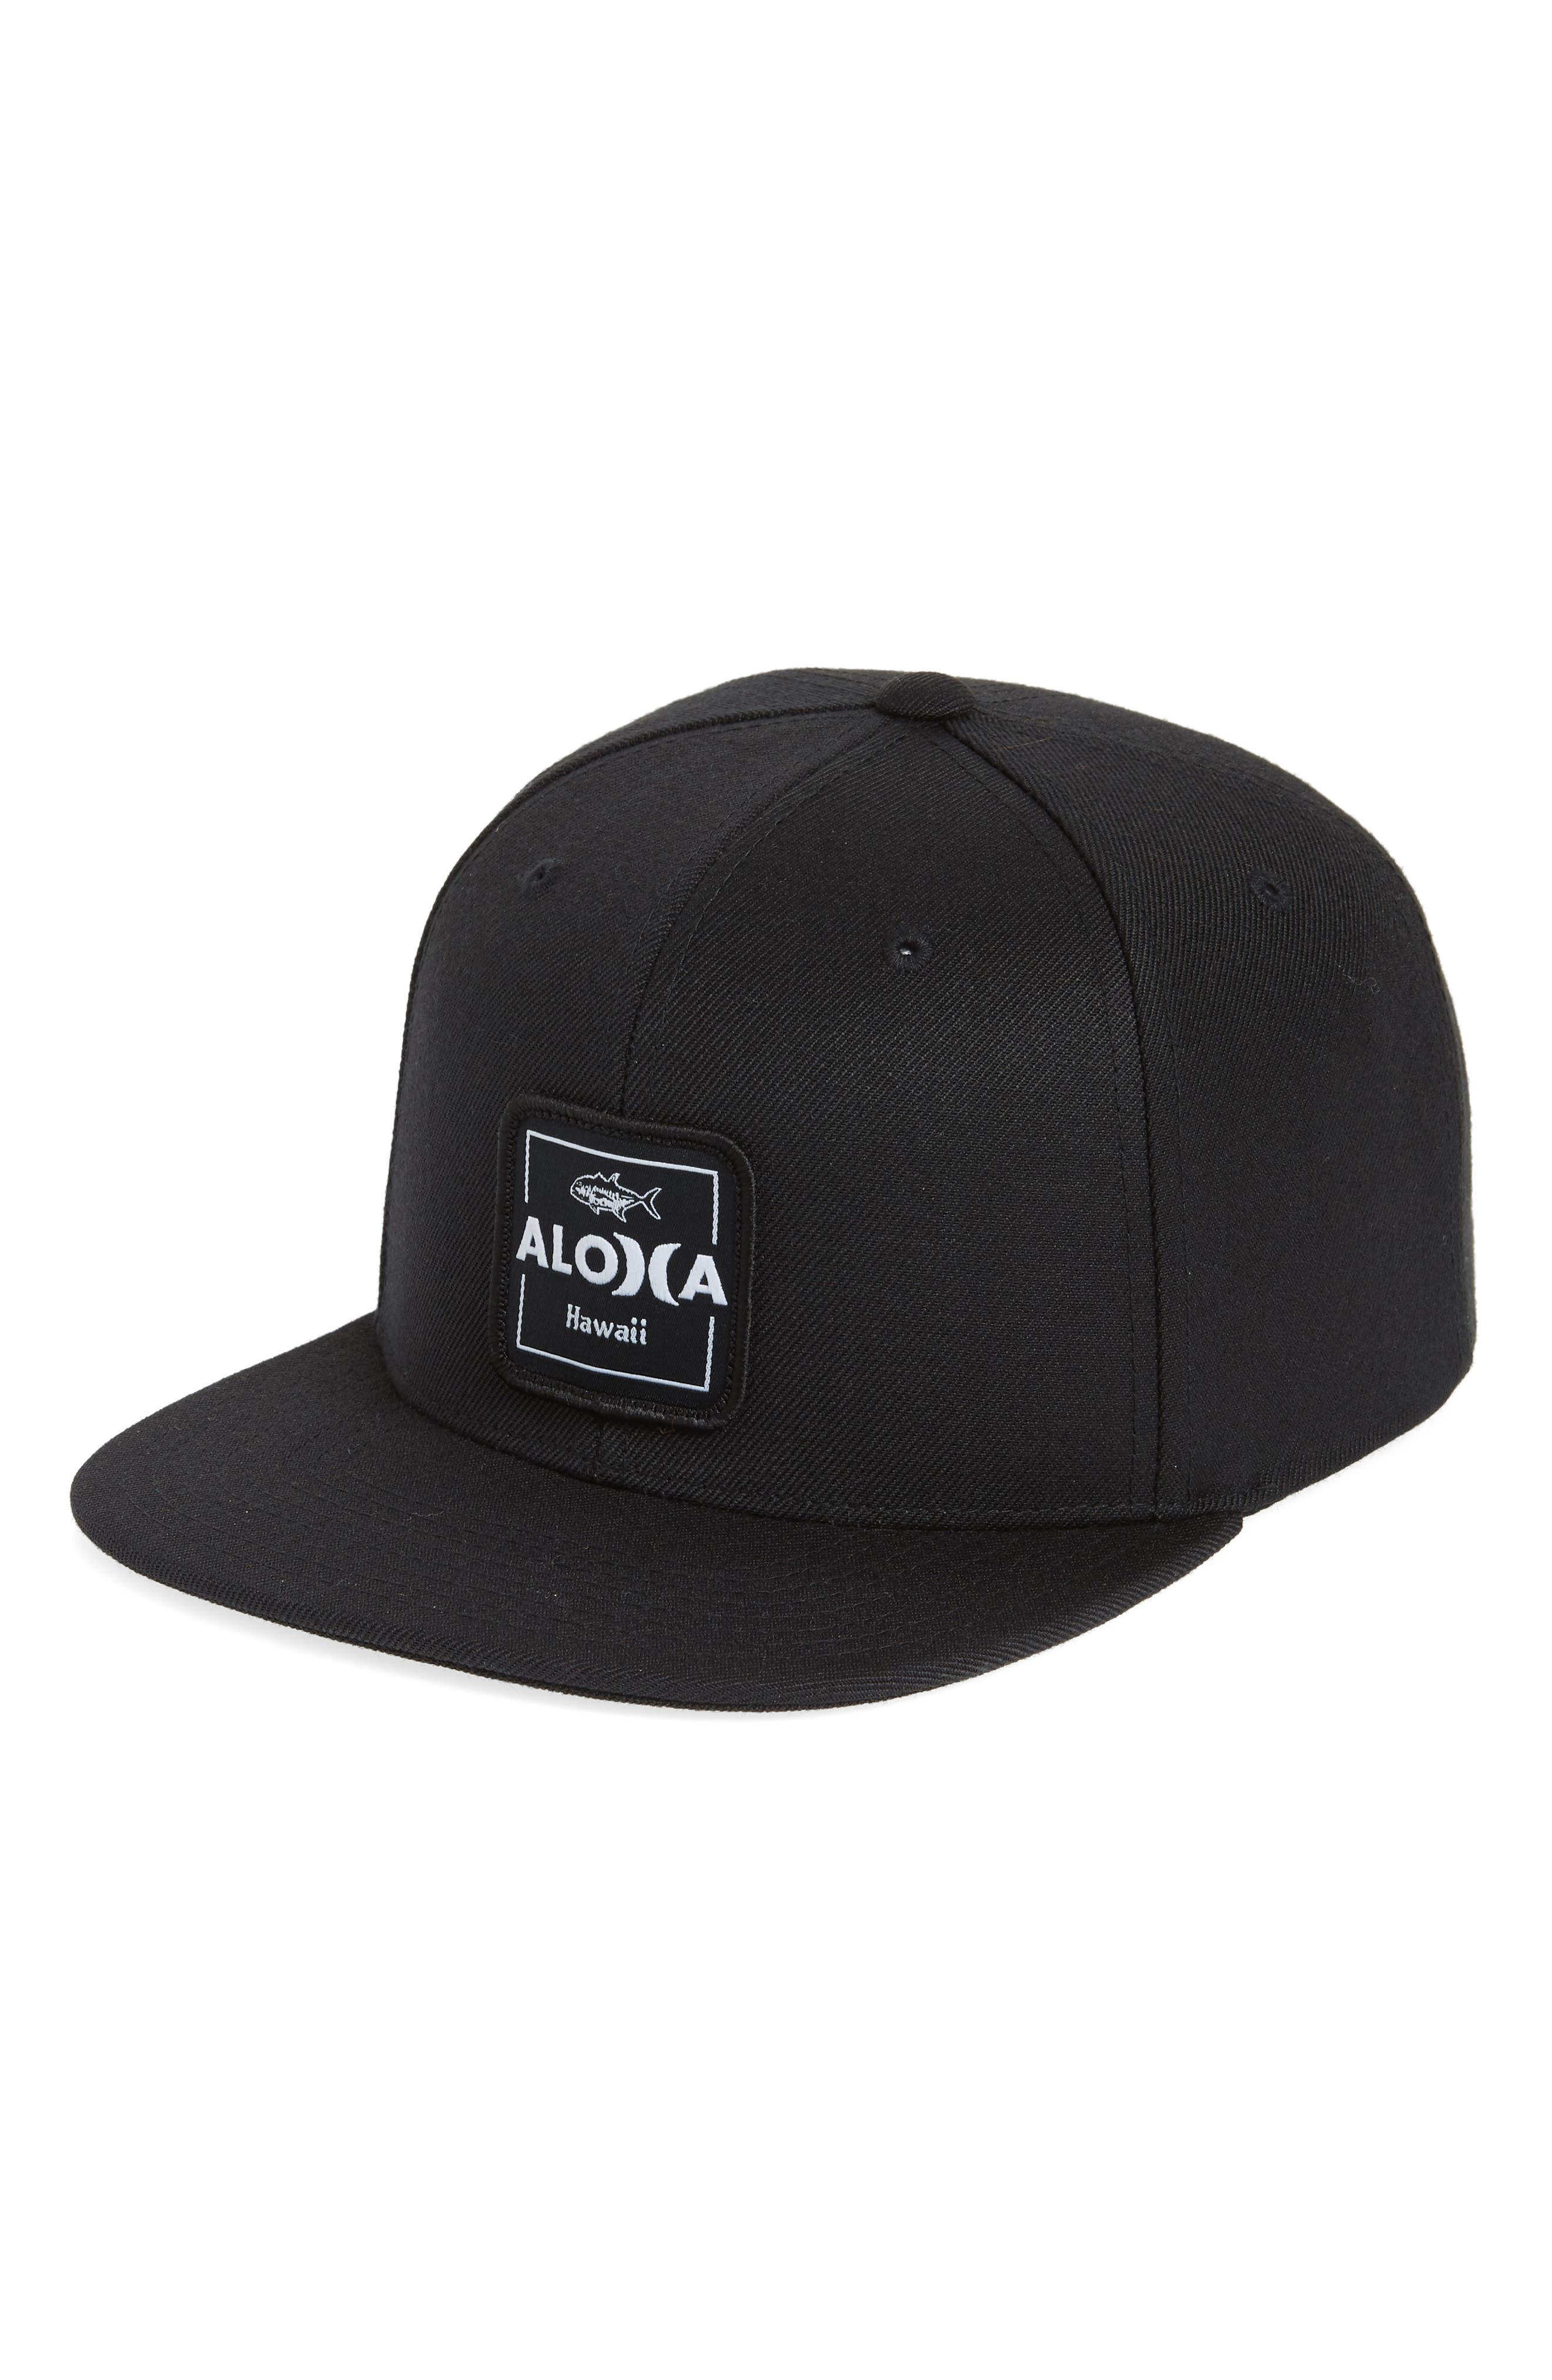 Aloha Cruiser 2 Cap,                             Main thumbnail 1, color,                             Black